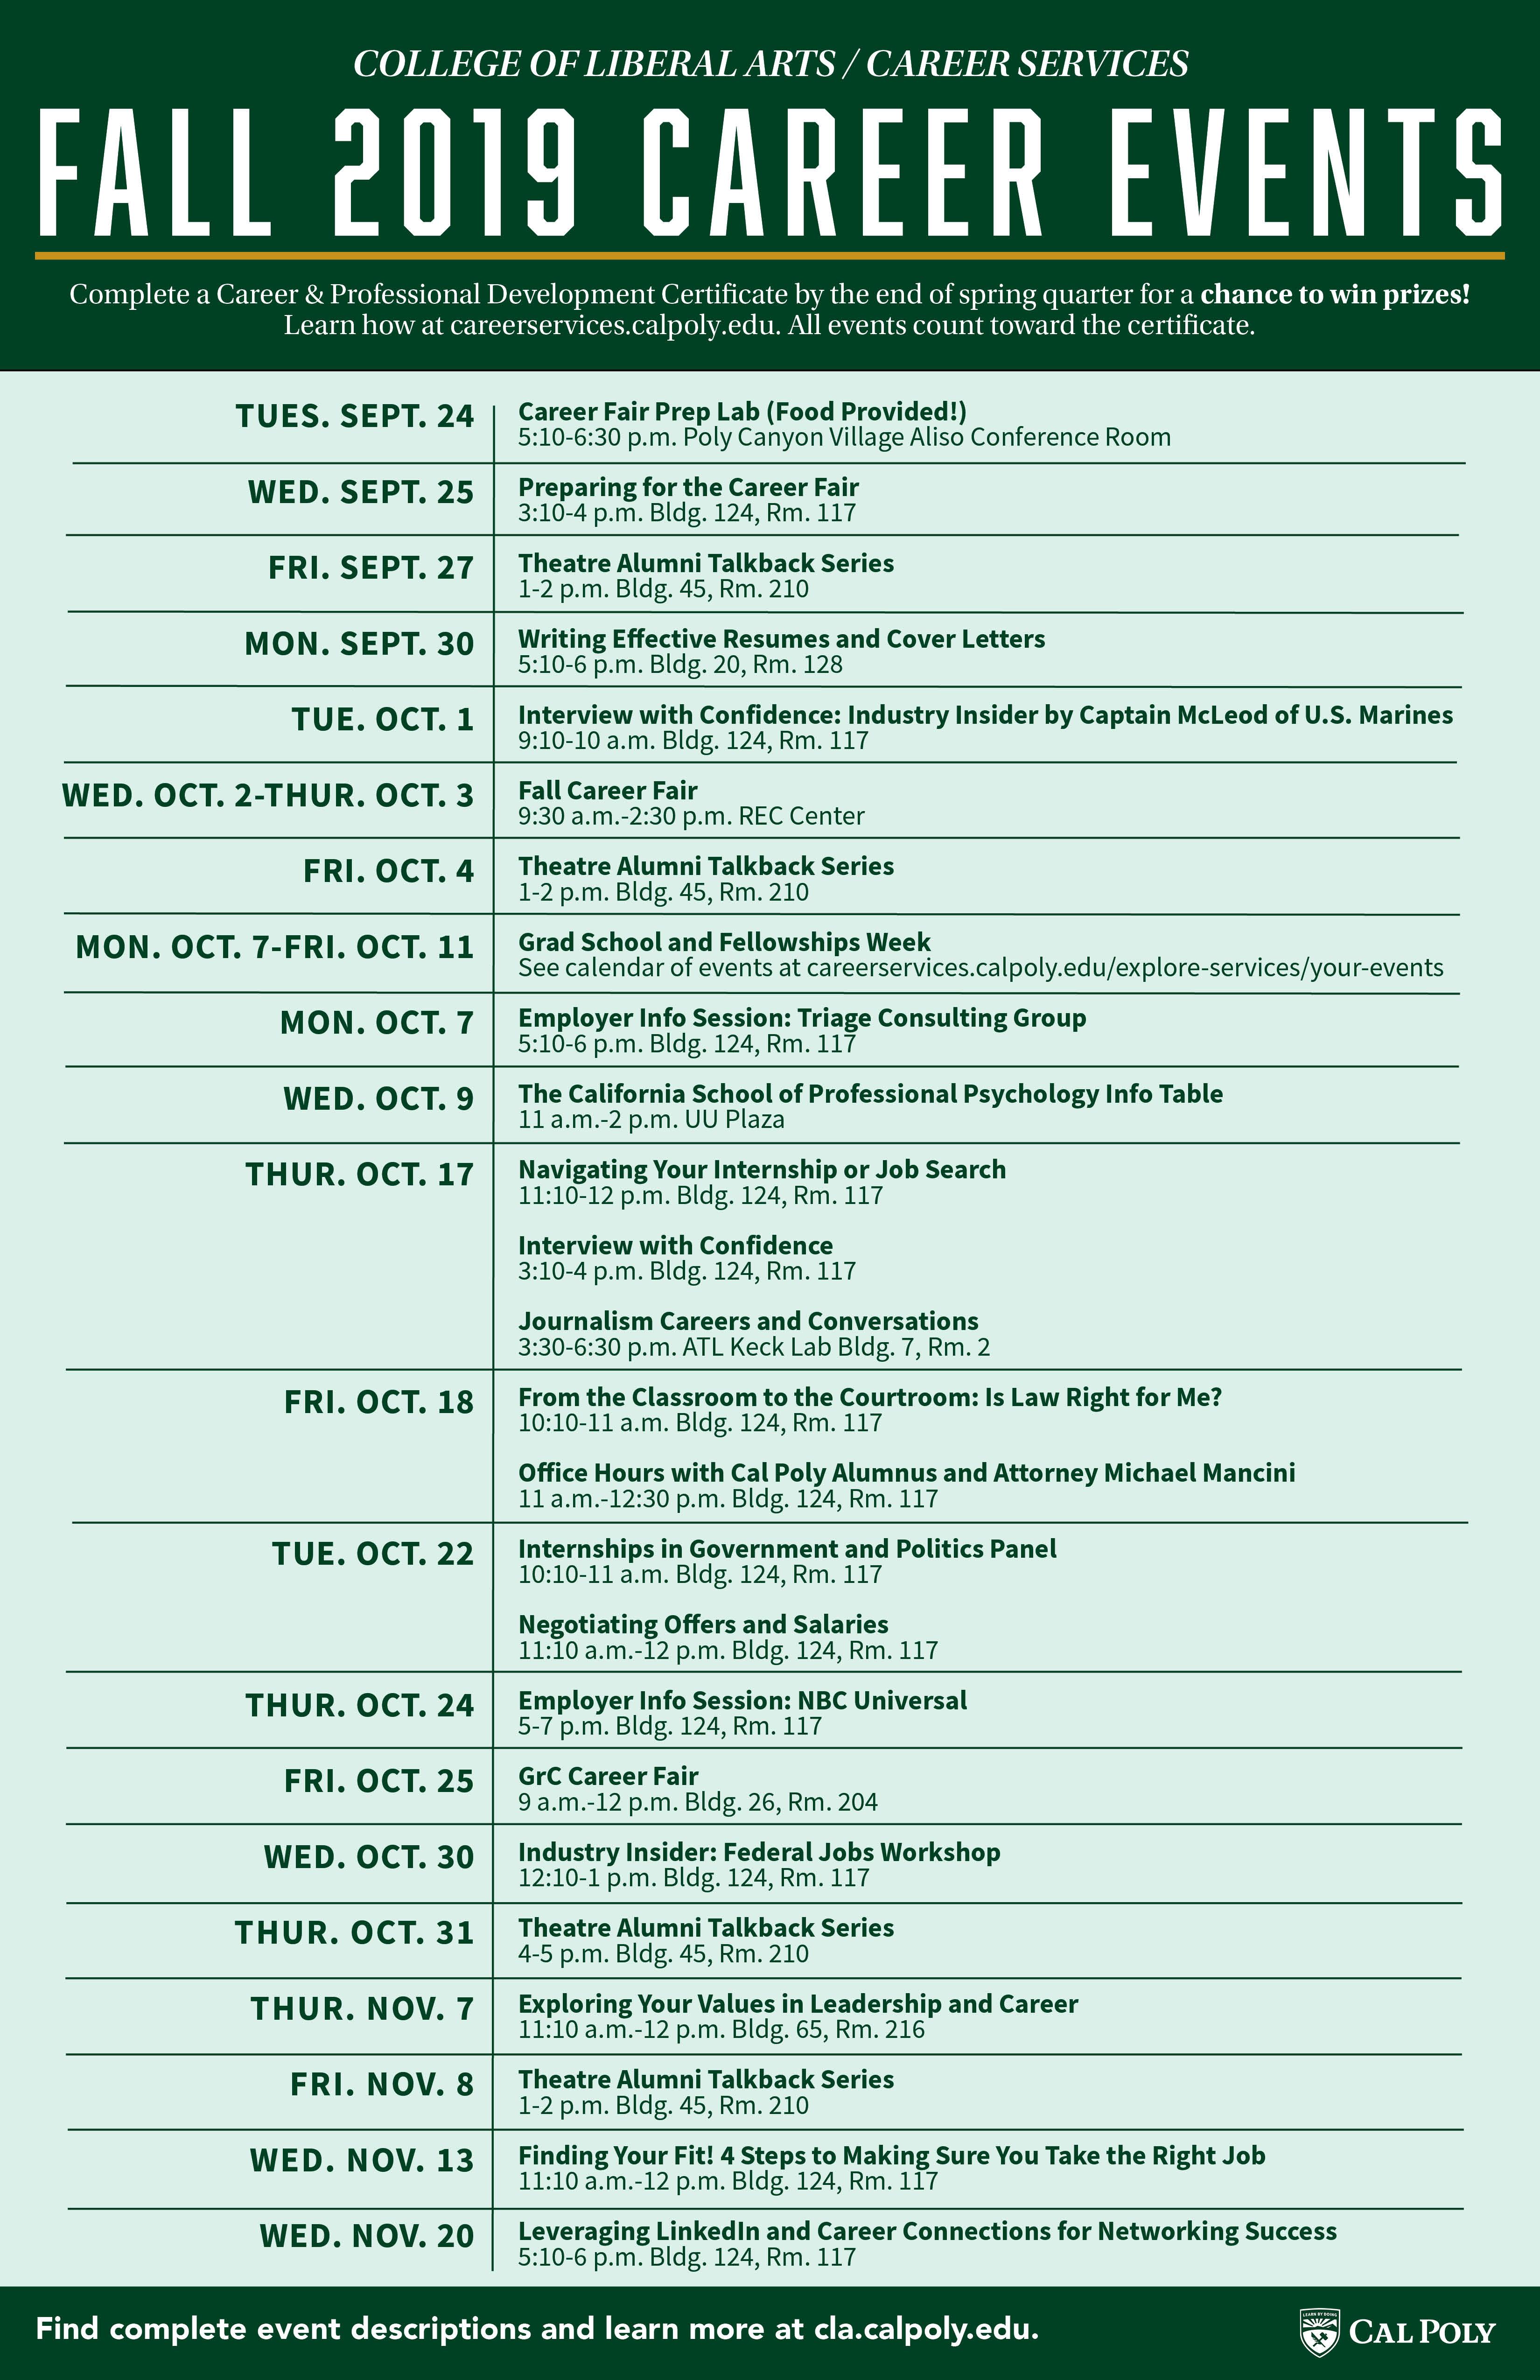 CLA Fall 2019 Career Event Schedule